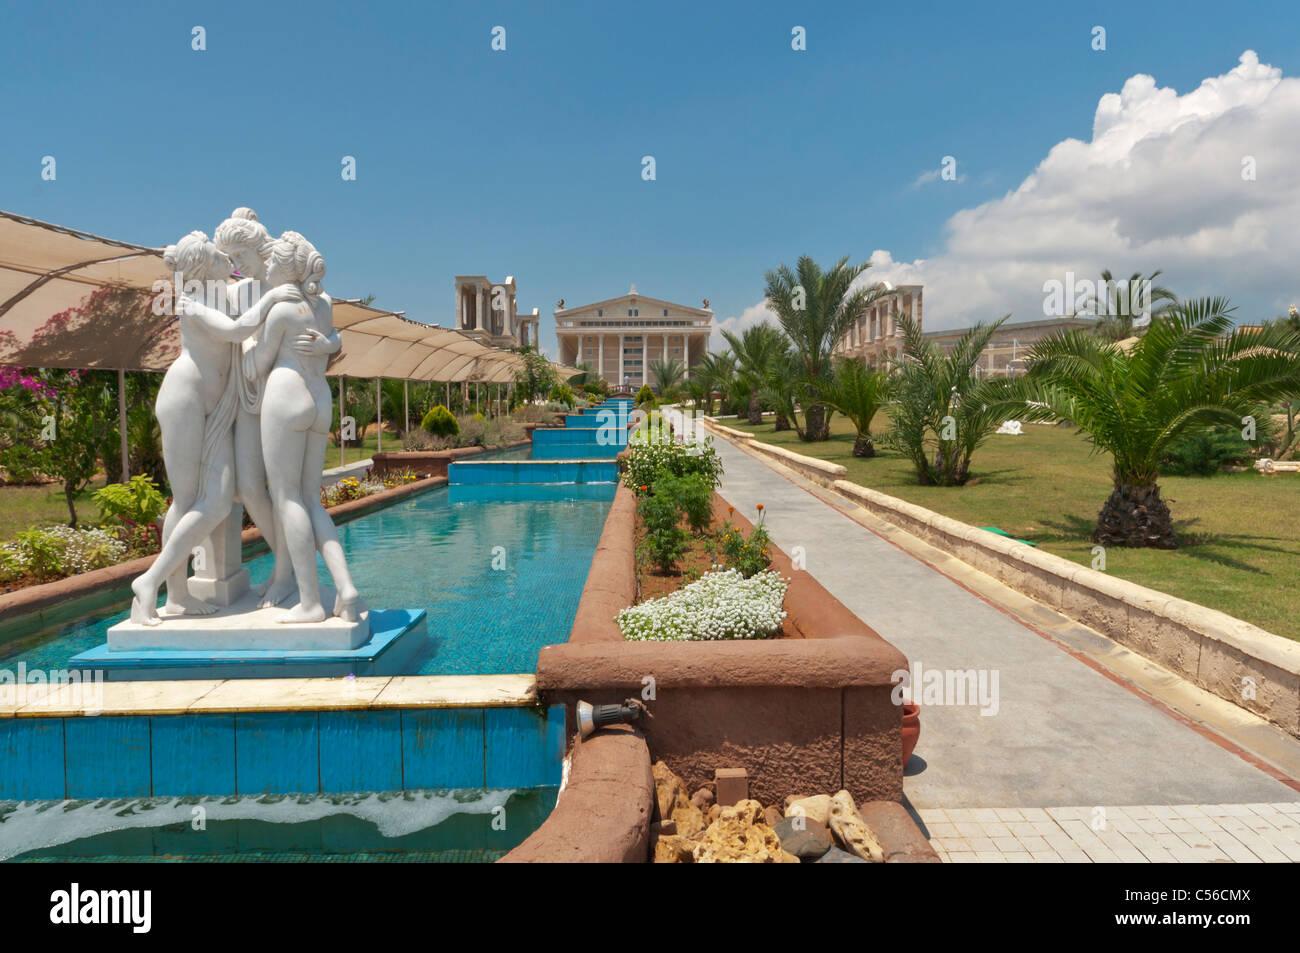 Kaya Artemis Resort Casino Identical Architecture With The Historic Stock Photo Alamy